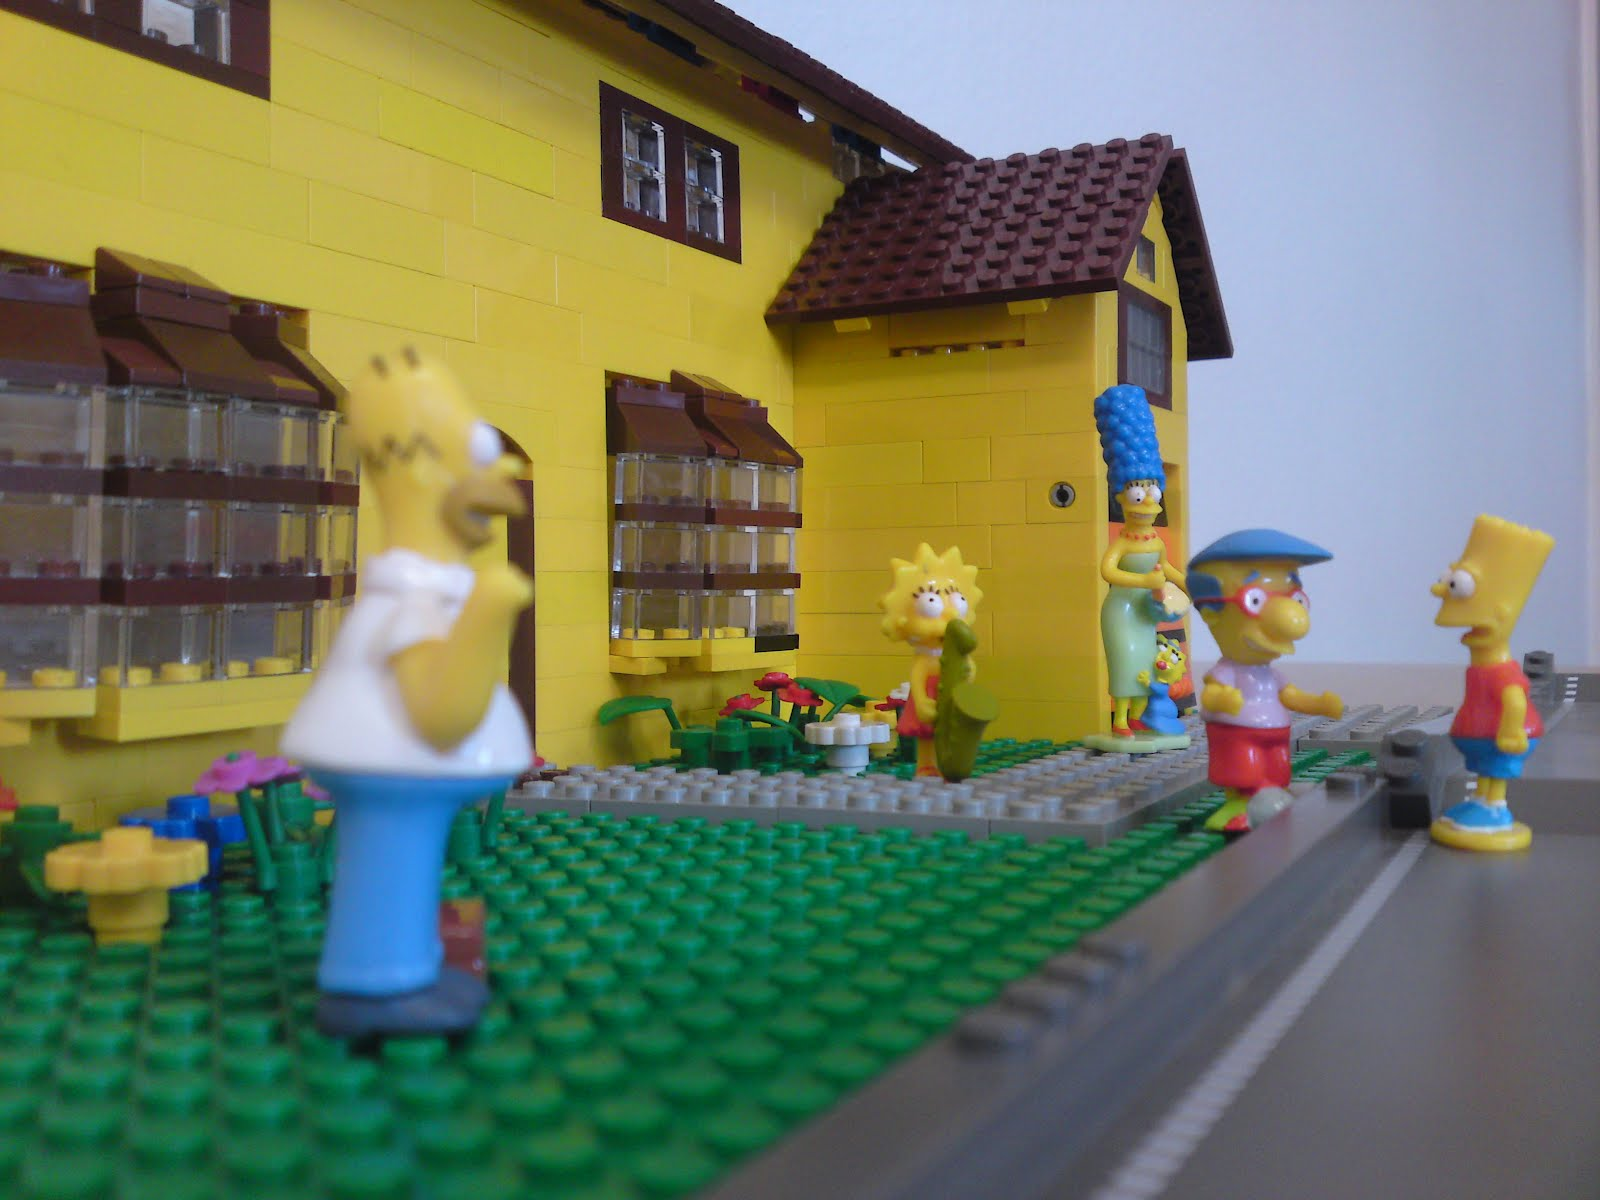 Lego Nerds: Evergreen Terrace - das Haus der Simpsons aus Lego